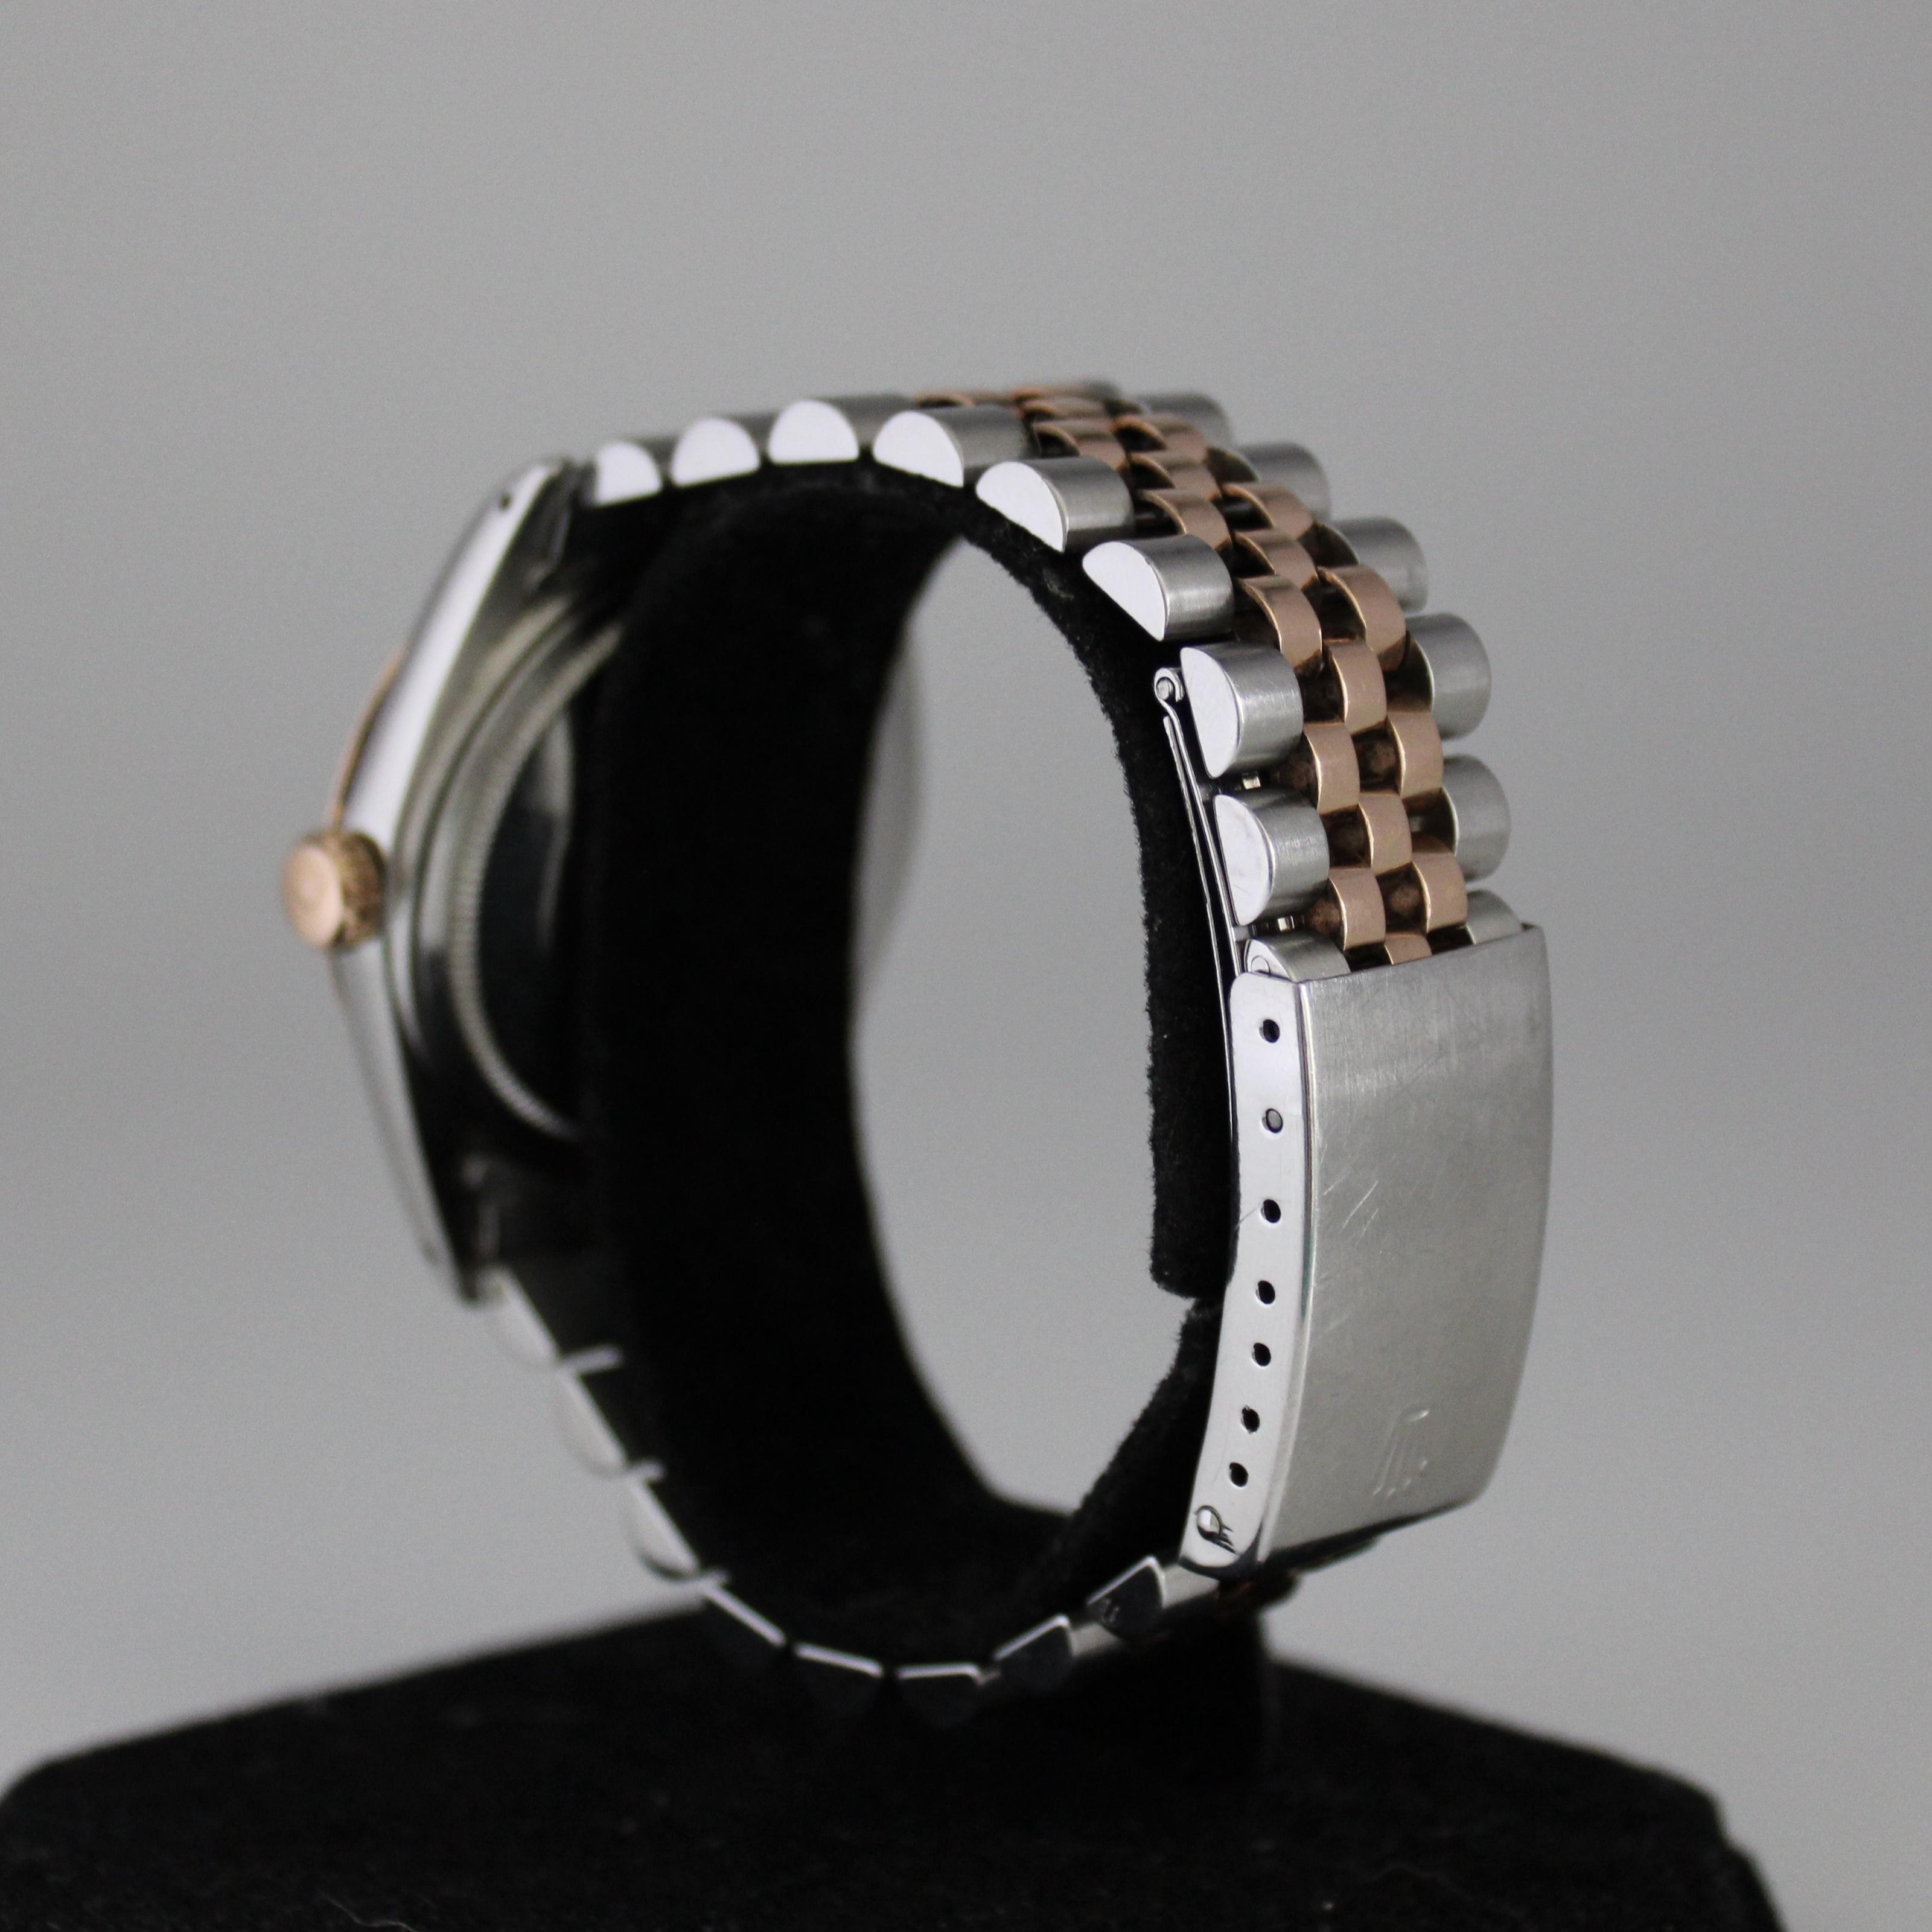 Rolex Datejust ref 1601 Steel & Pink Gold - Image 4 of 8